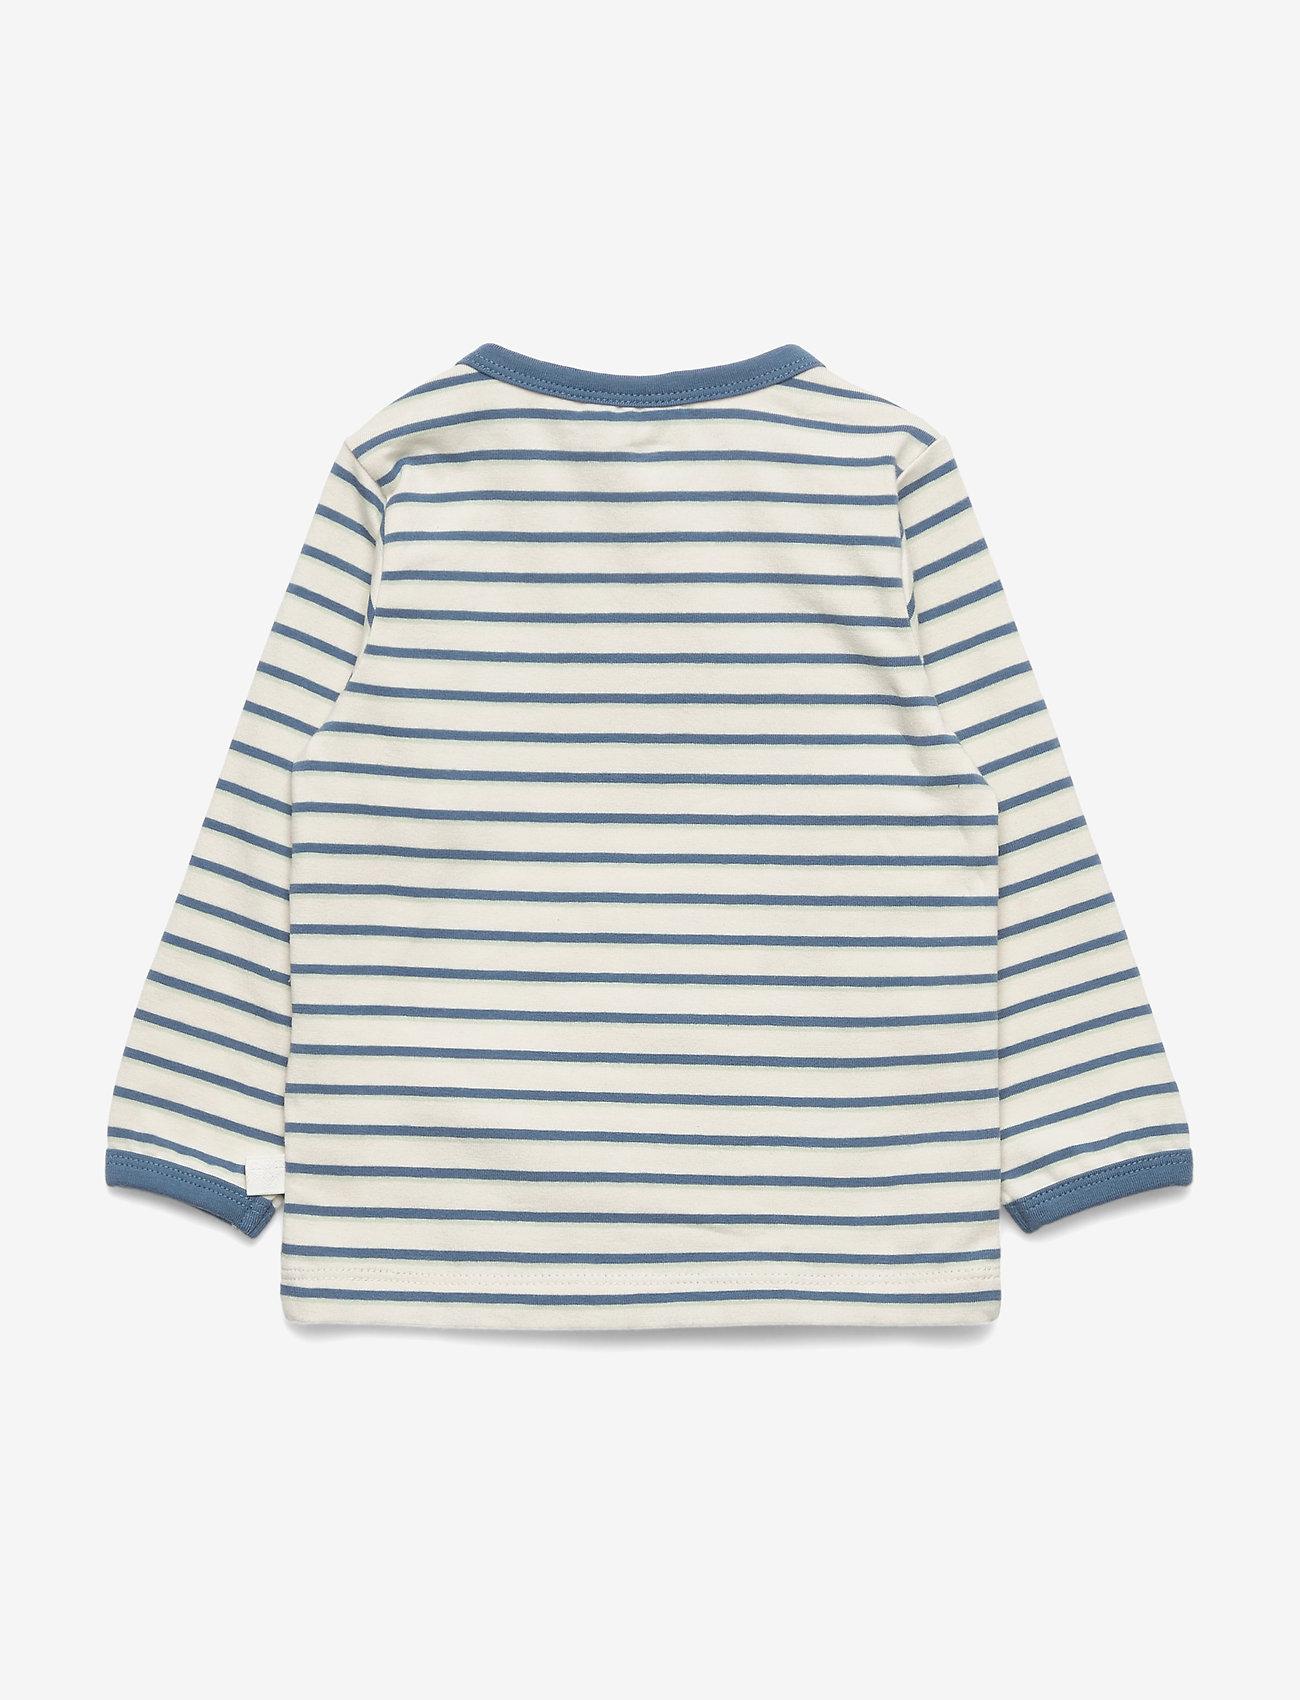 Hummel - hmlALAN T-SHIRT L/S - long-sleeved t-shirts - stellar - 1